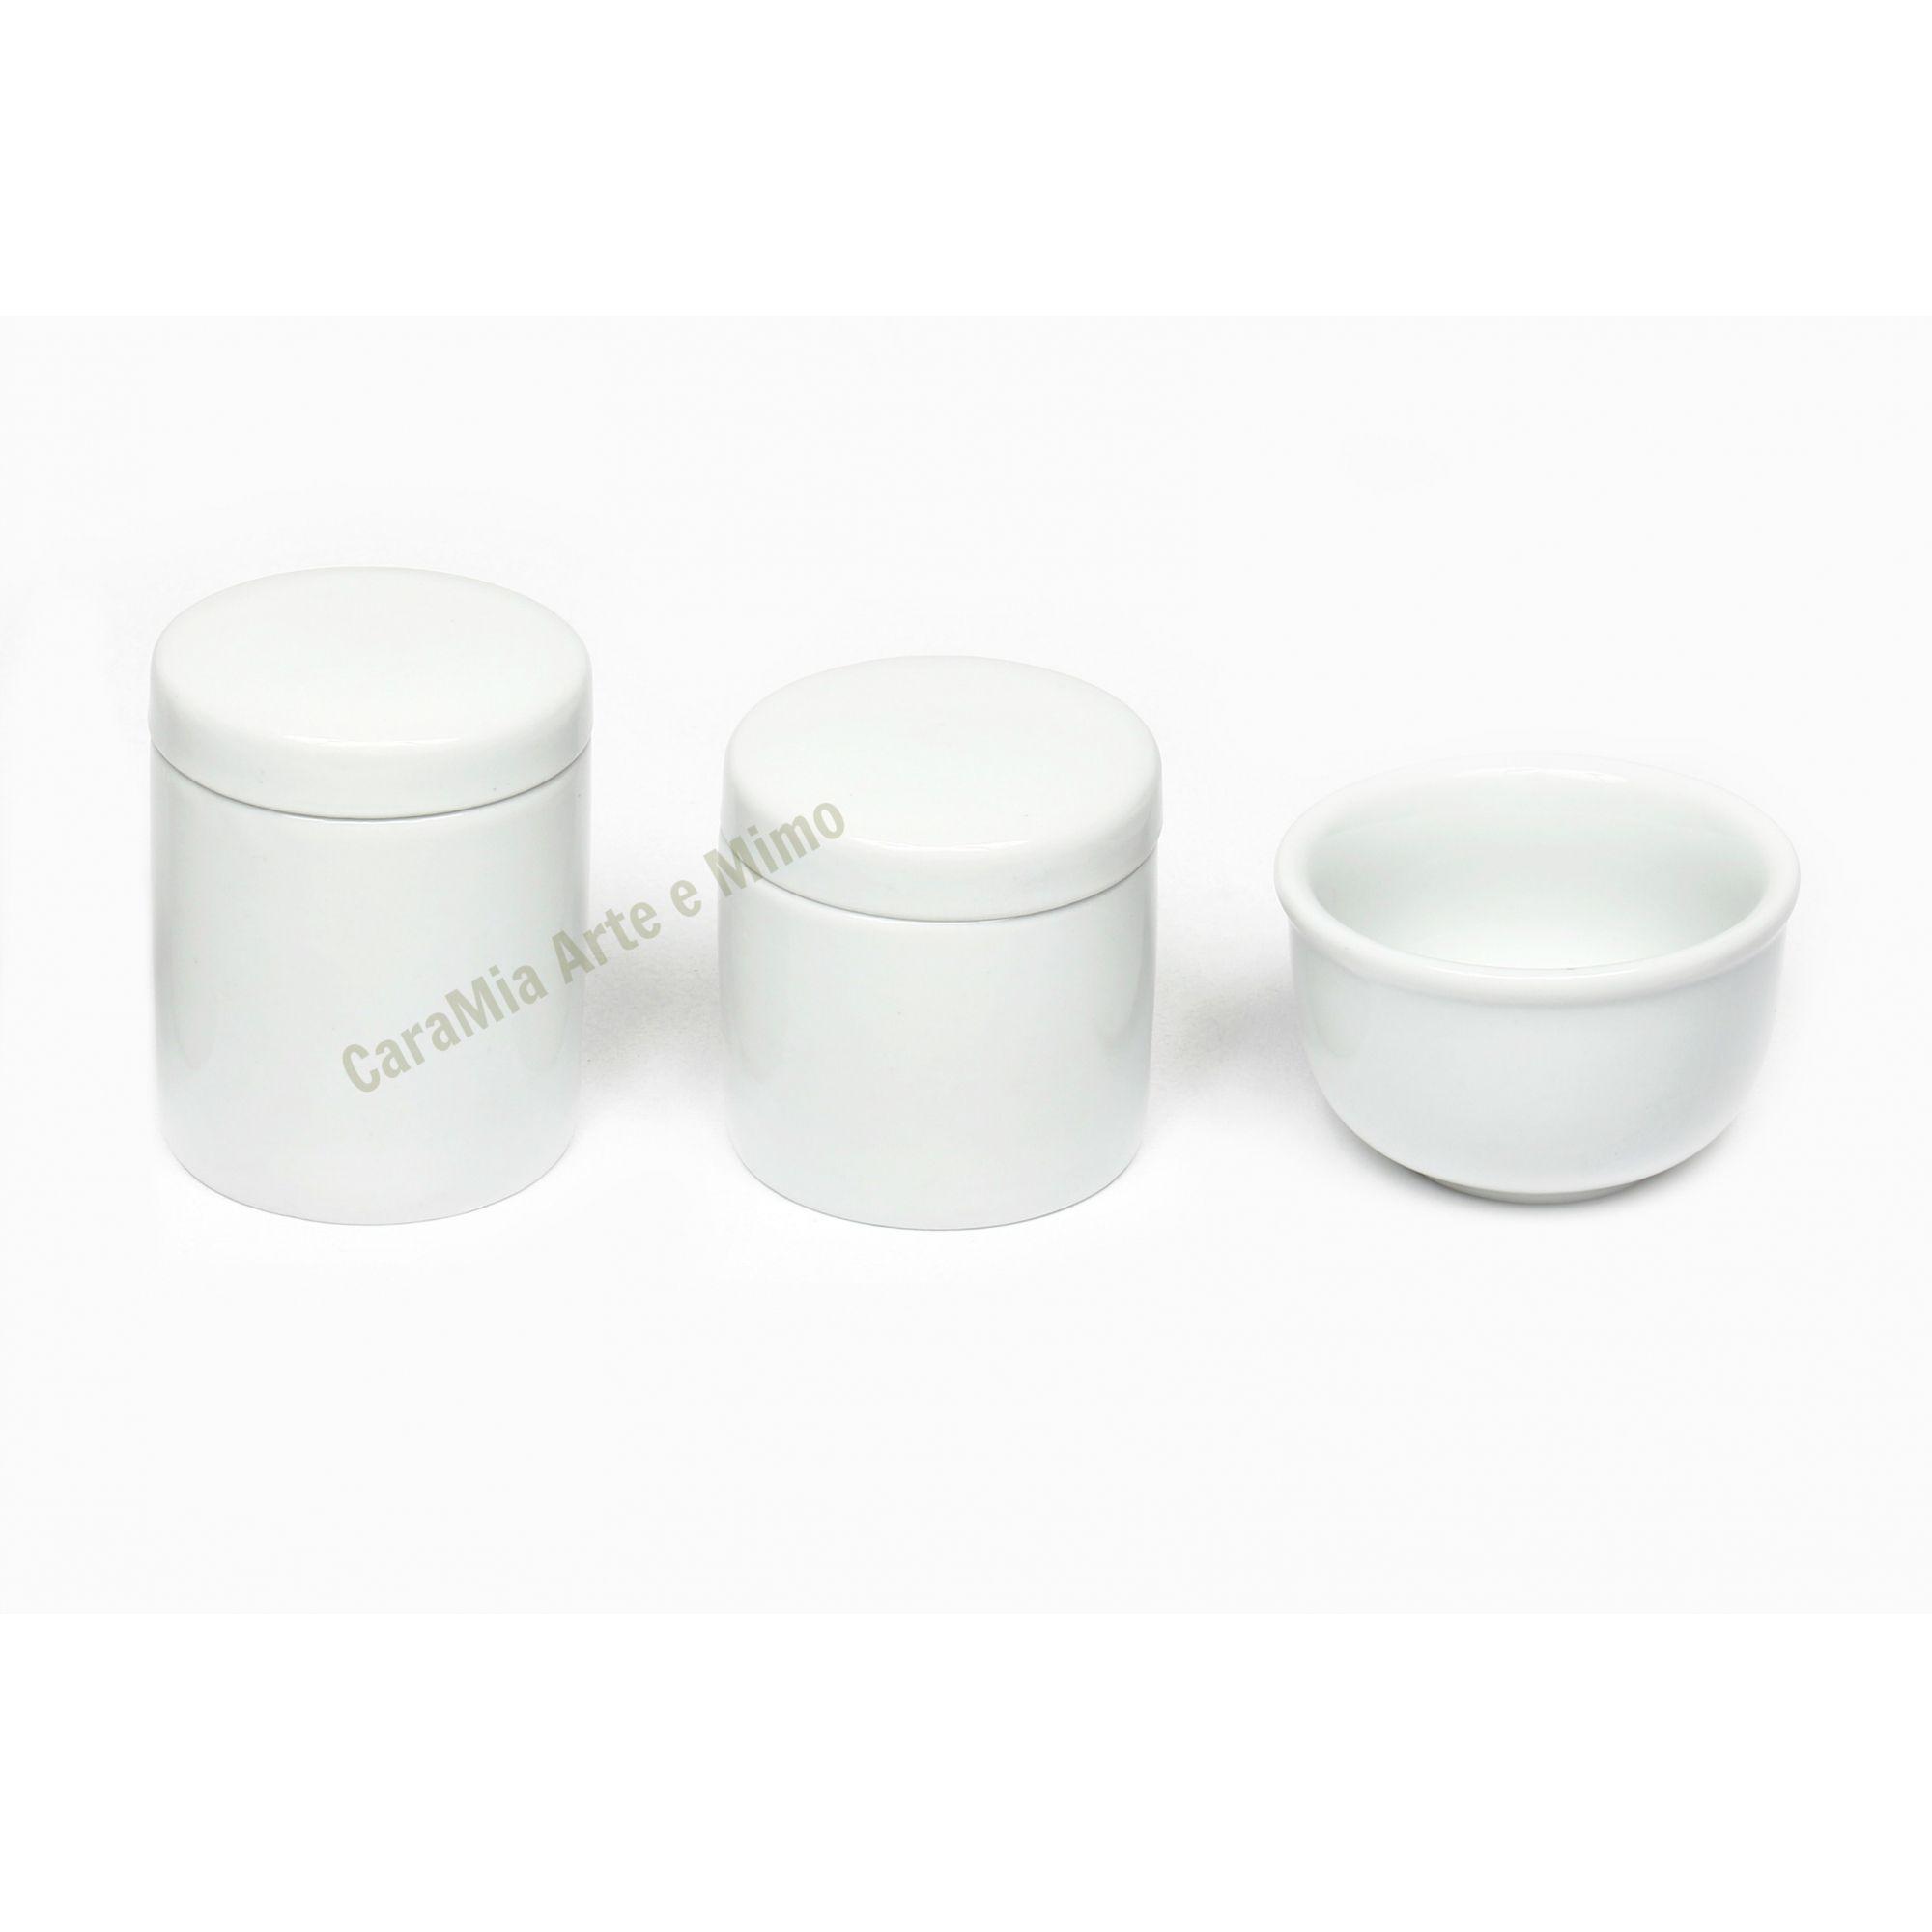 Kit Higiene Bebê Porcelana Branca Lisa | 3 peças